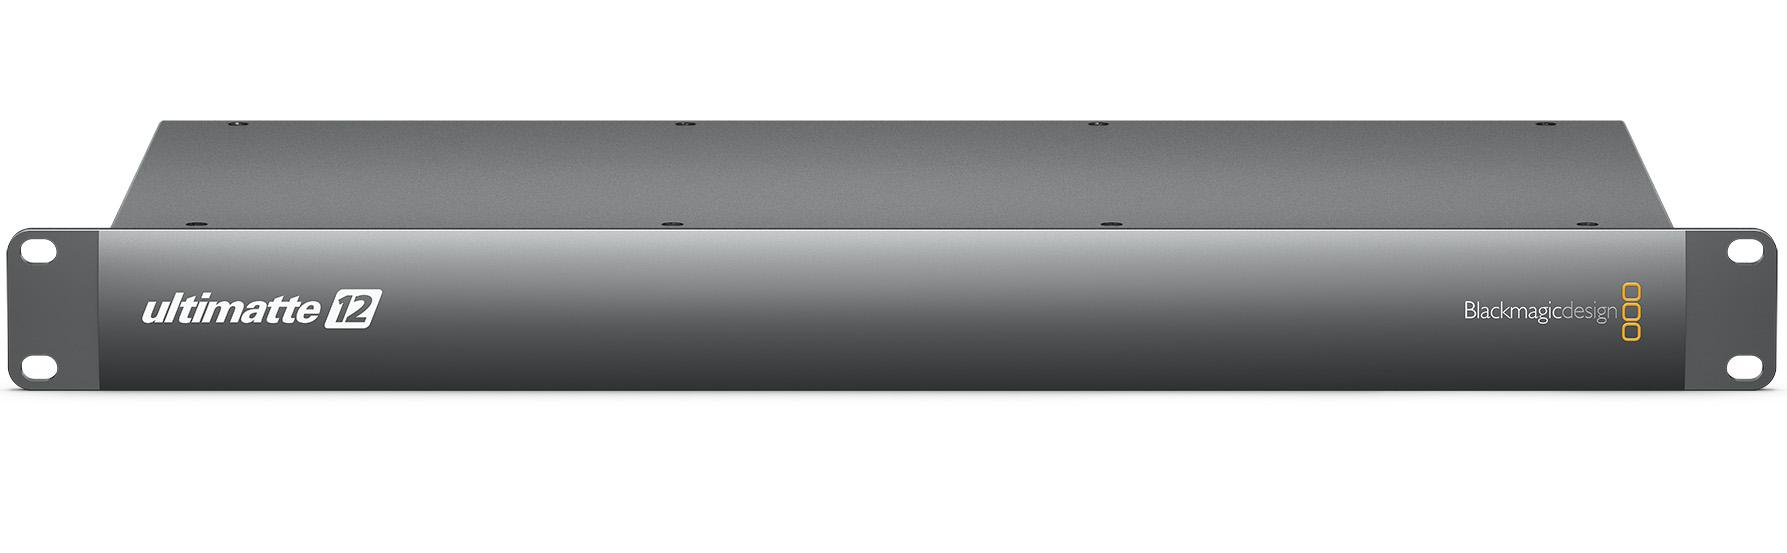 Ultimatte 12 - BMD-ULTMKEY12 - 4K / UHD green screen compositing